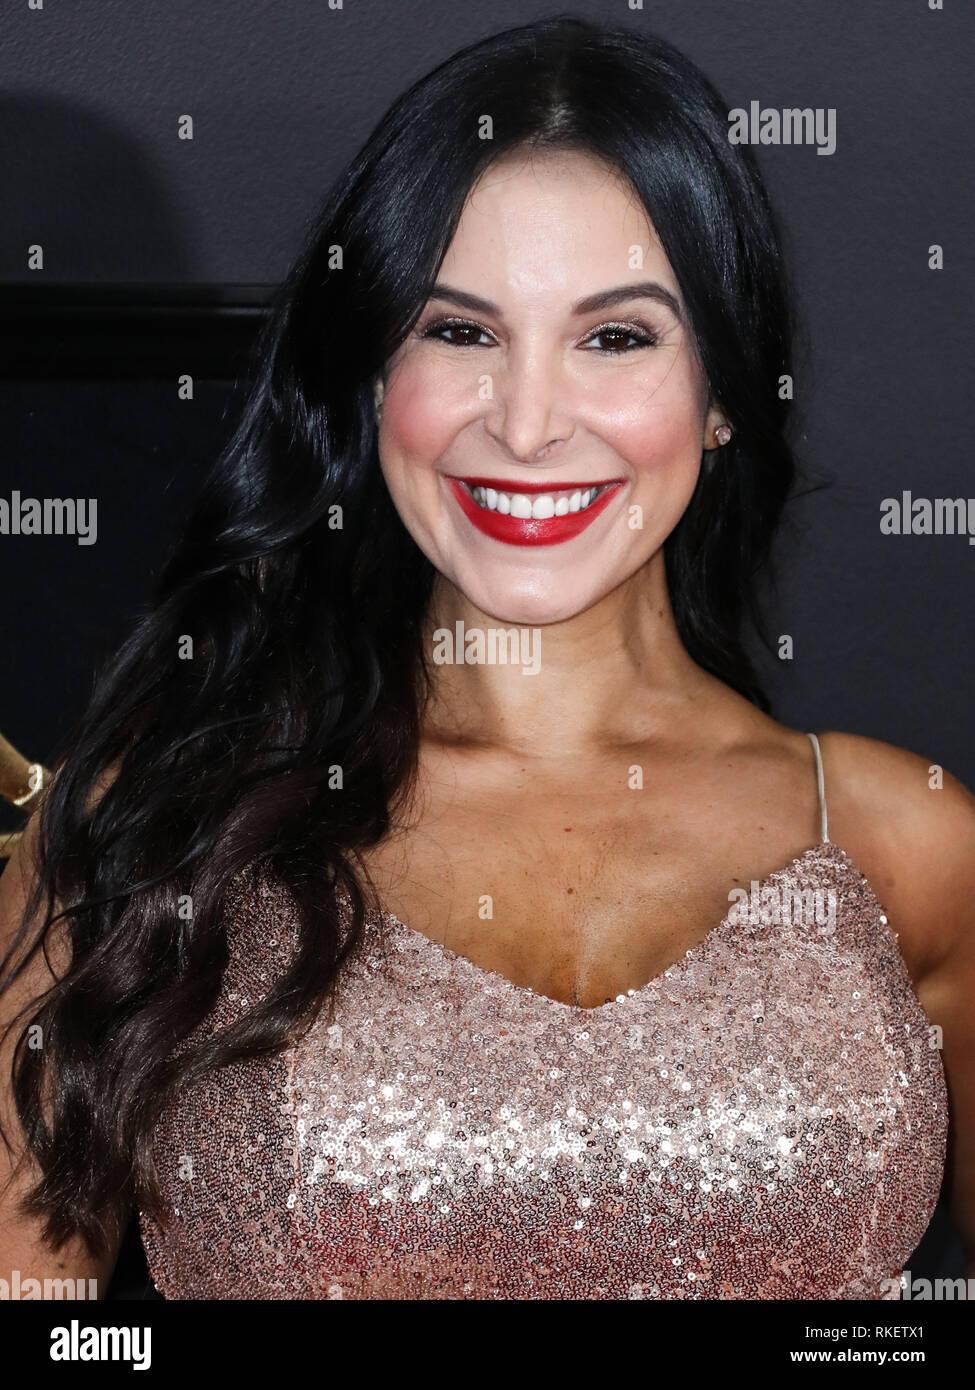 2019 Mayra Veronica nude photos 2019